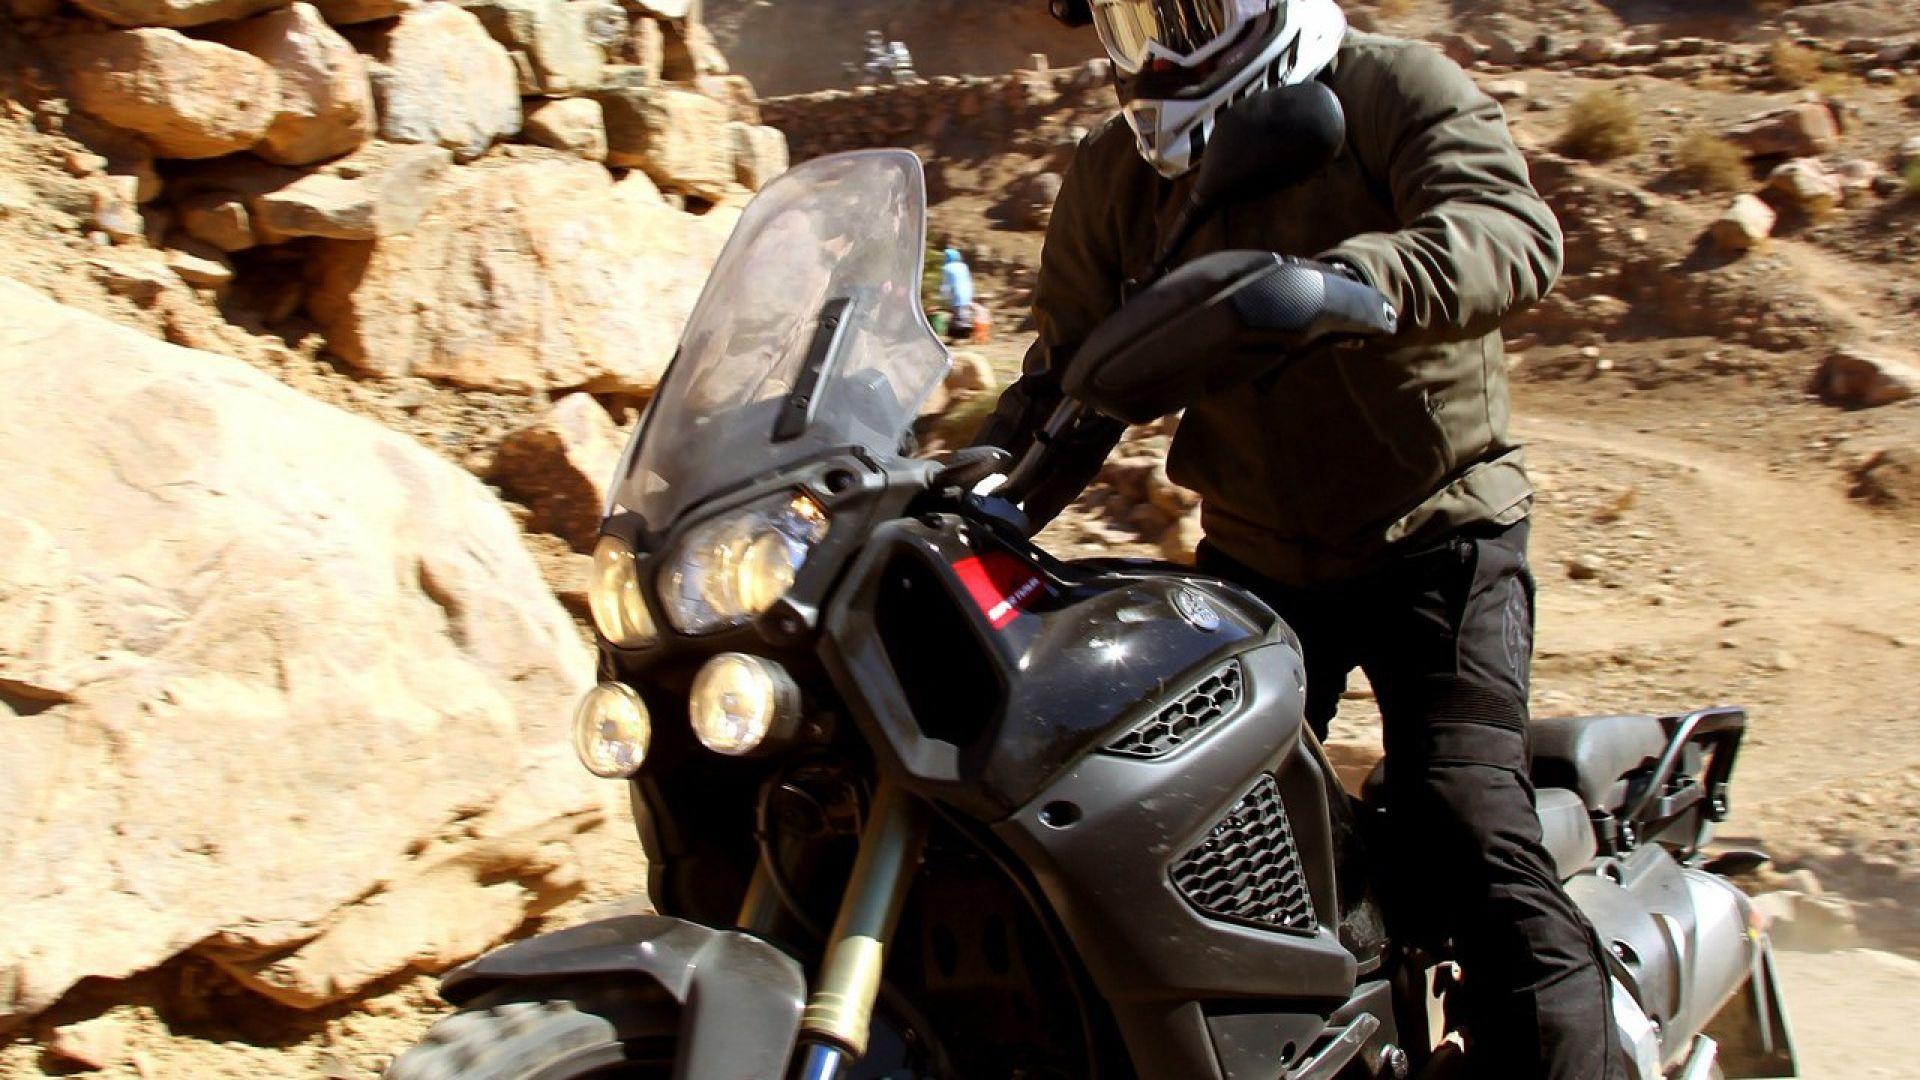 Immagine 123: In Marocco con la Yamaha Super Ténéré